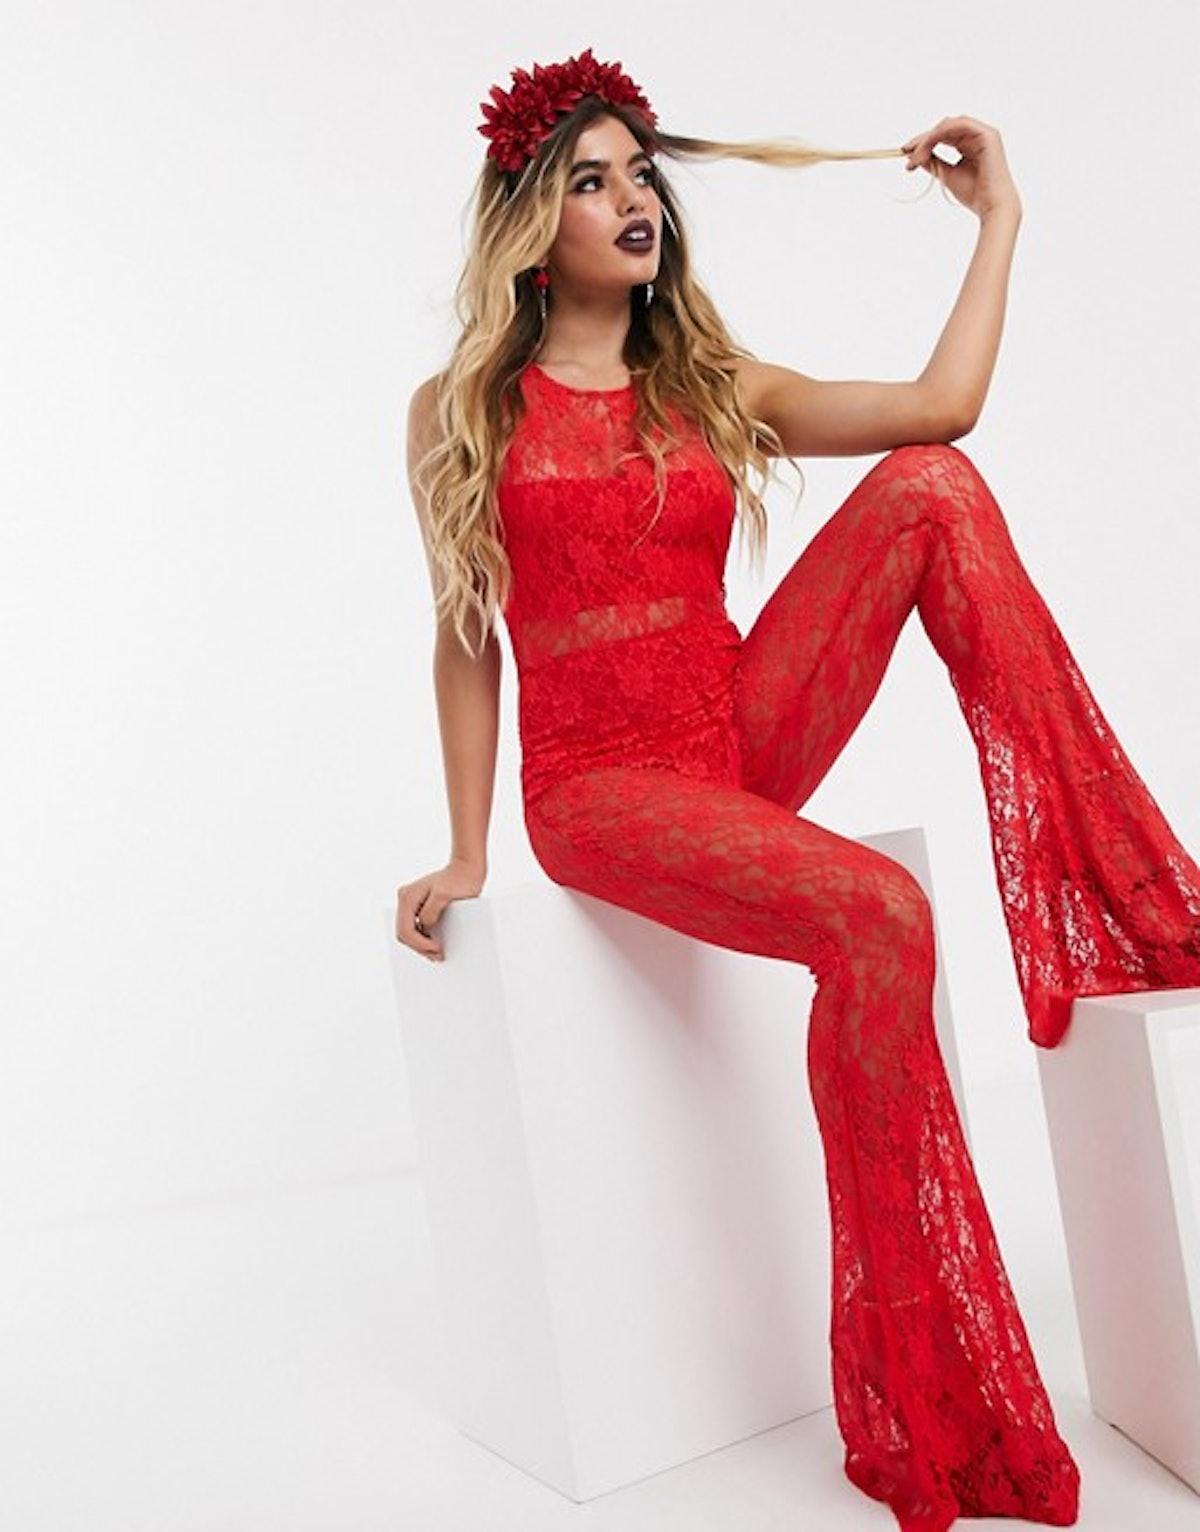 ASOS Design Halloween Red Lace Jumpsuit